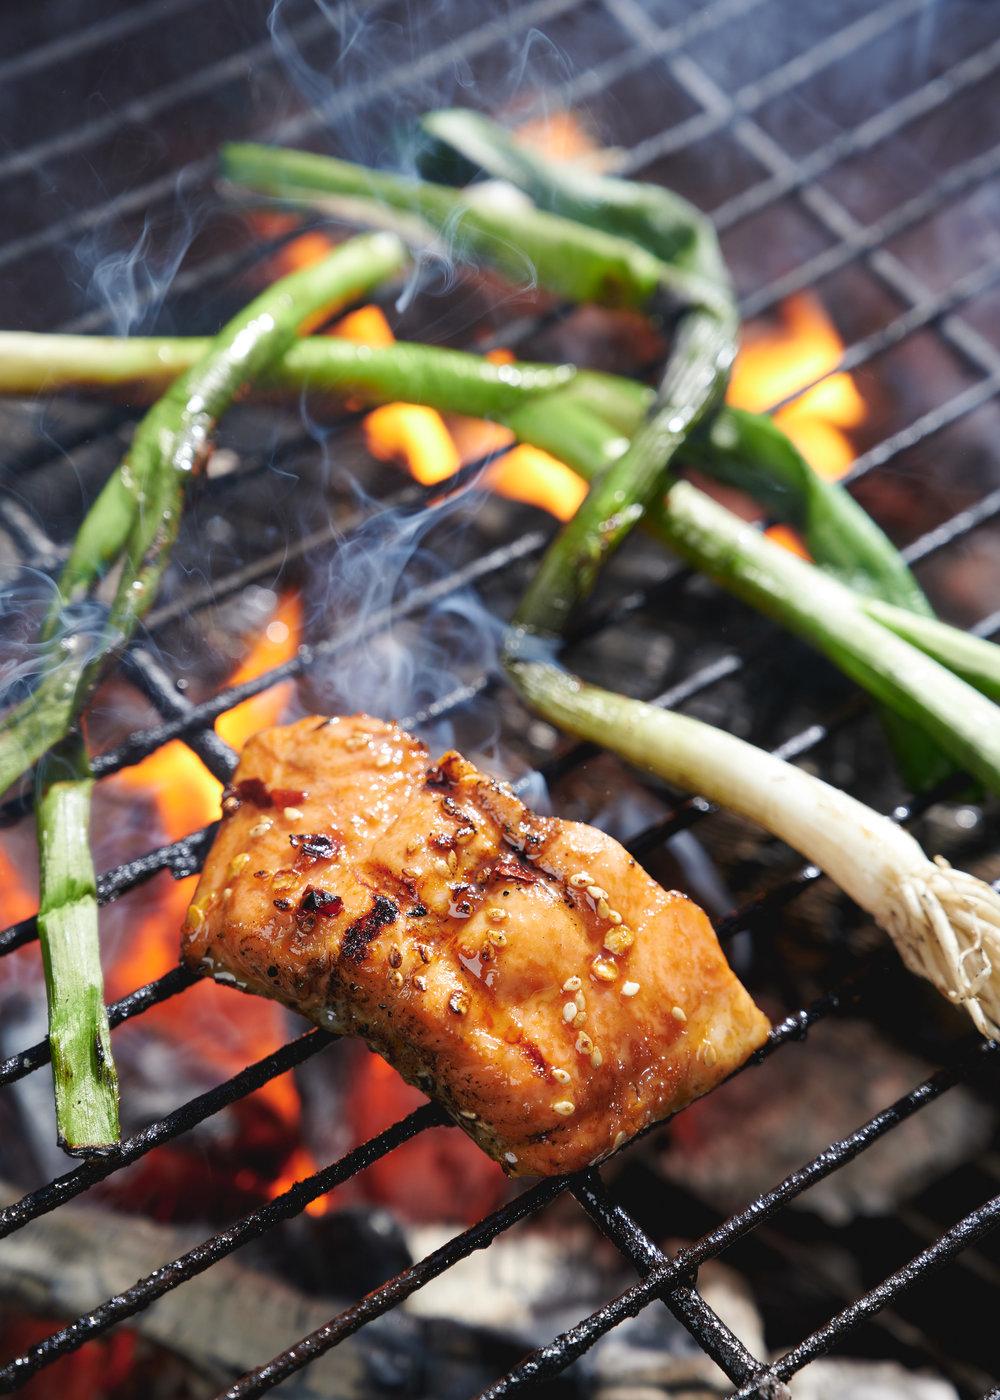 19-03-30-SeafoodBBQ-1817Website.jpg